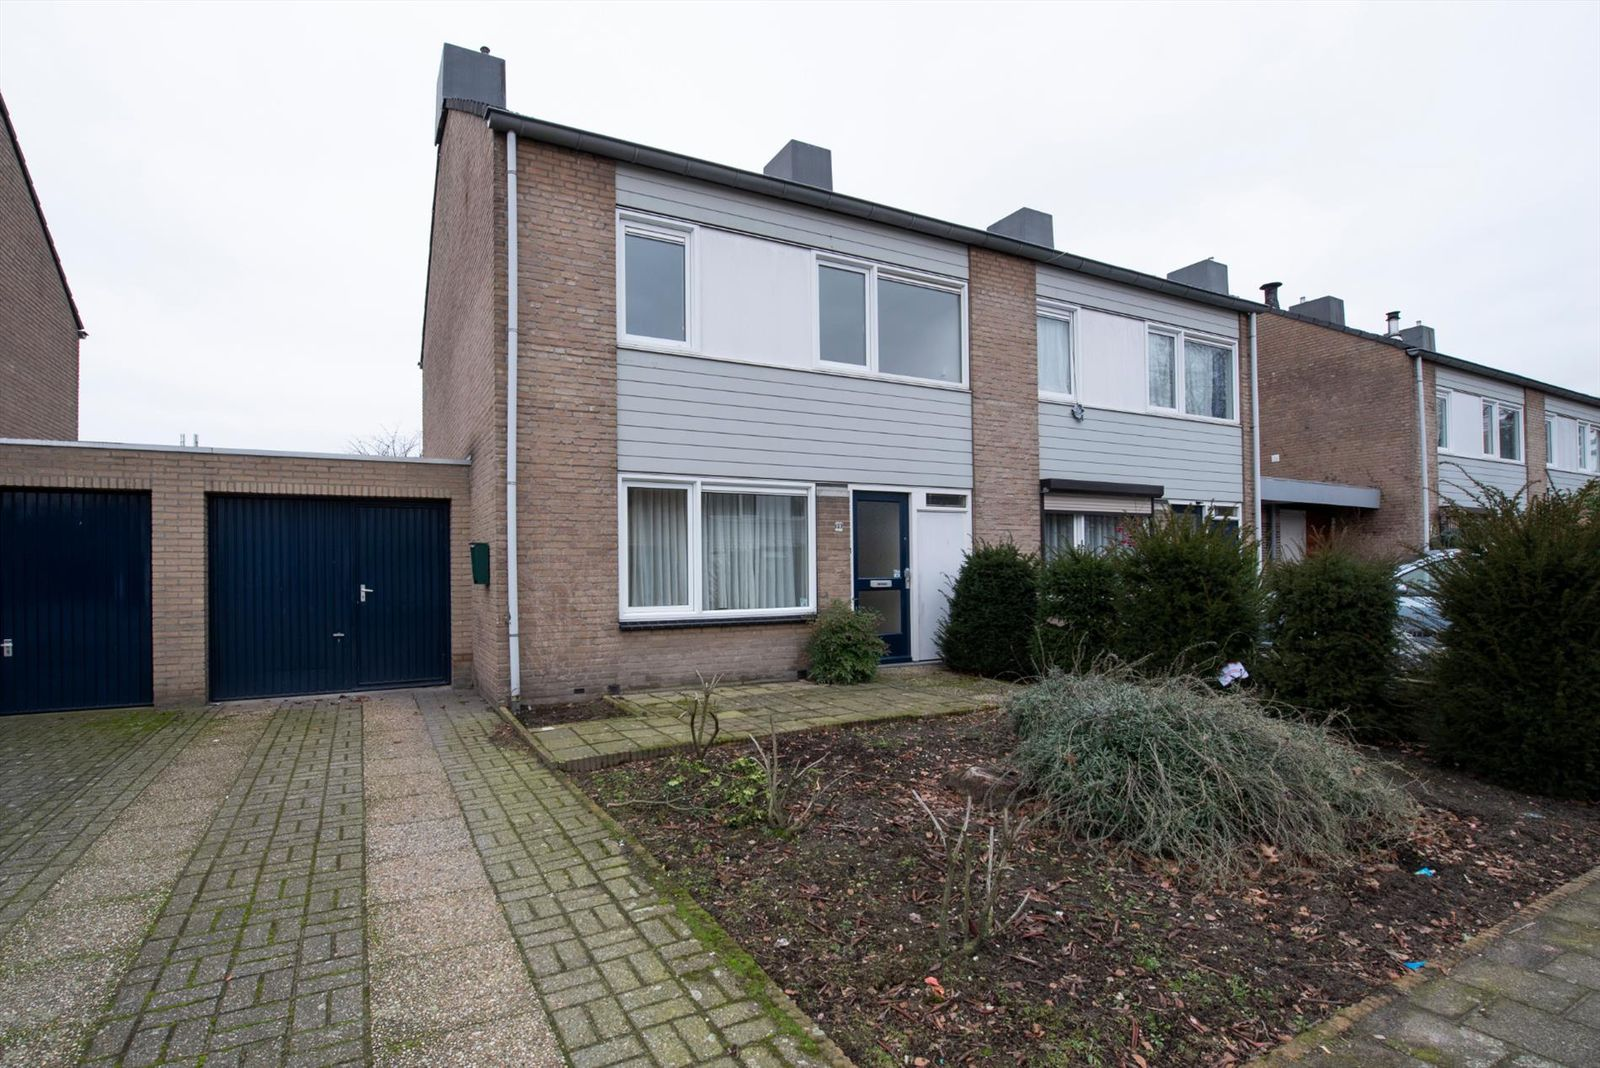 Sint Lambertusstraat 60, Budel-Schoot